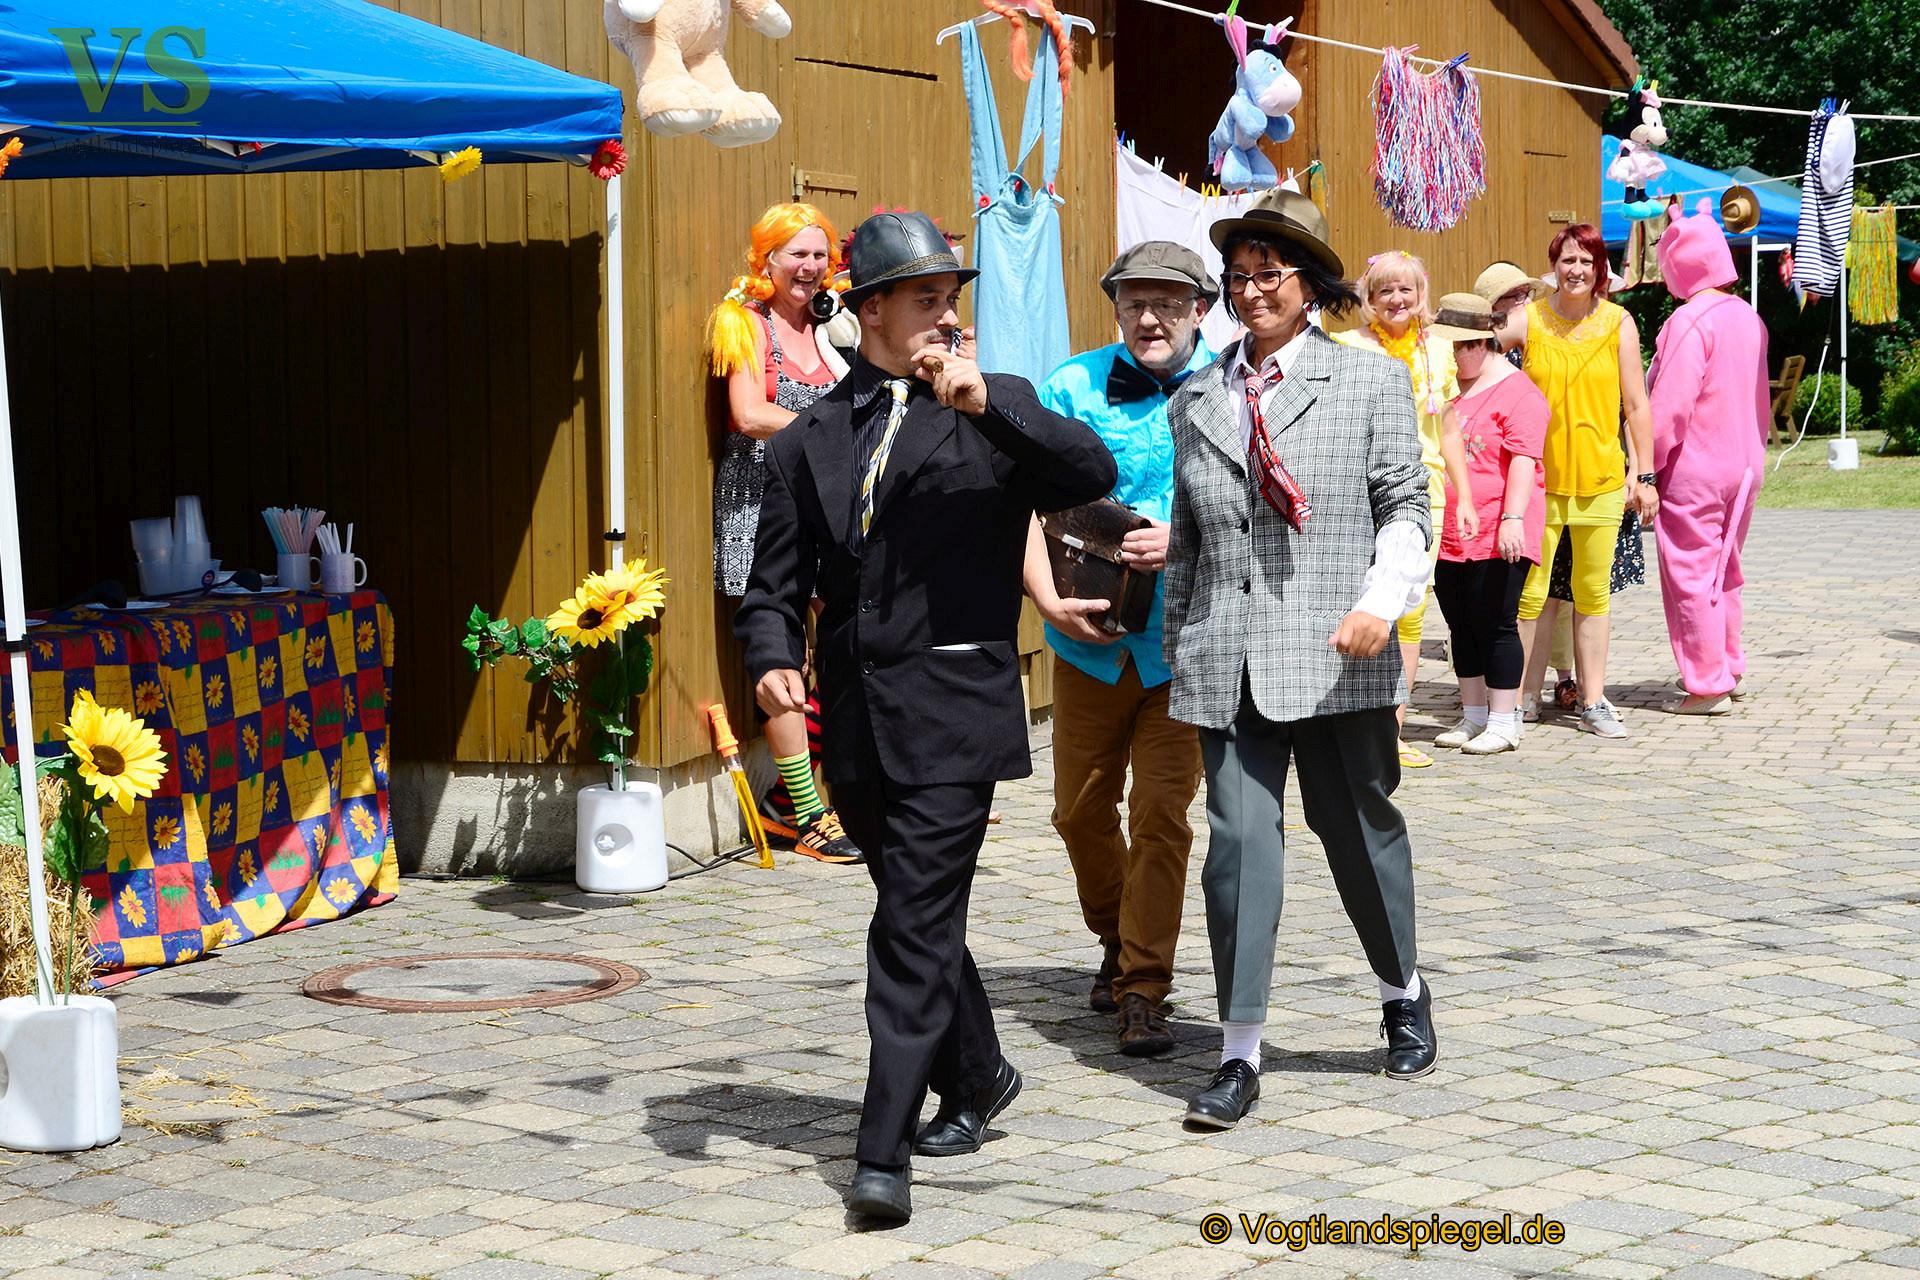 Sommerfest der Lebenshilfe Mohlsdorf: Legendäre Olsenbande gesichtet